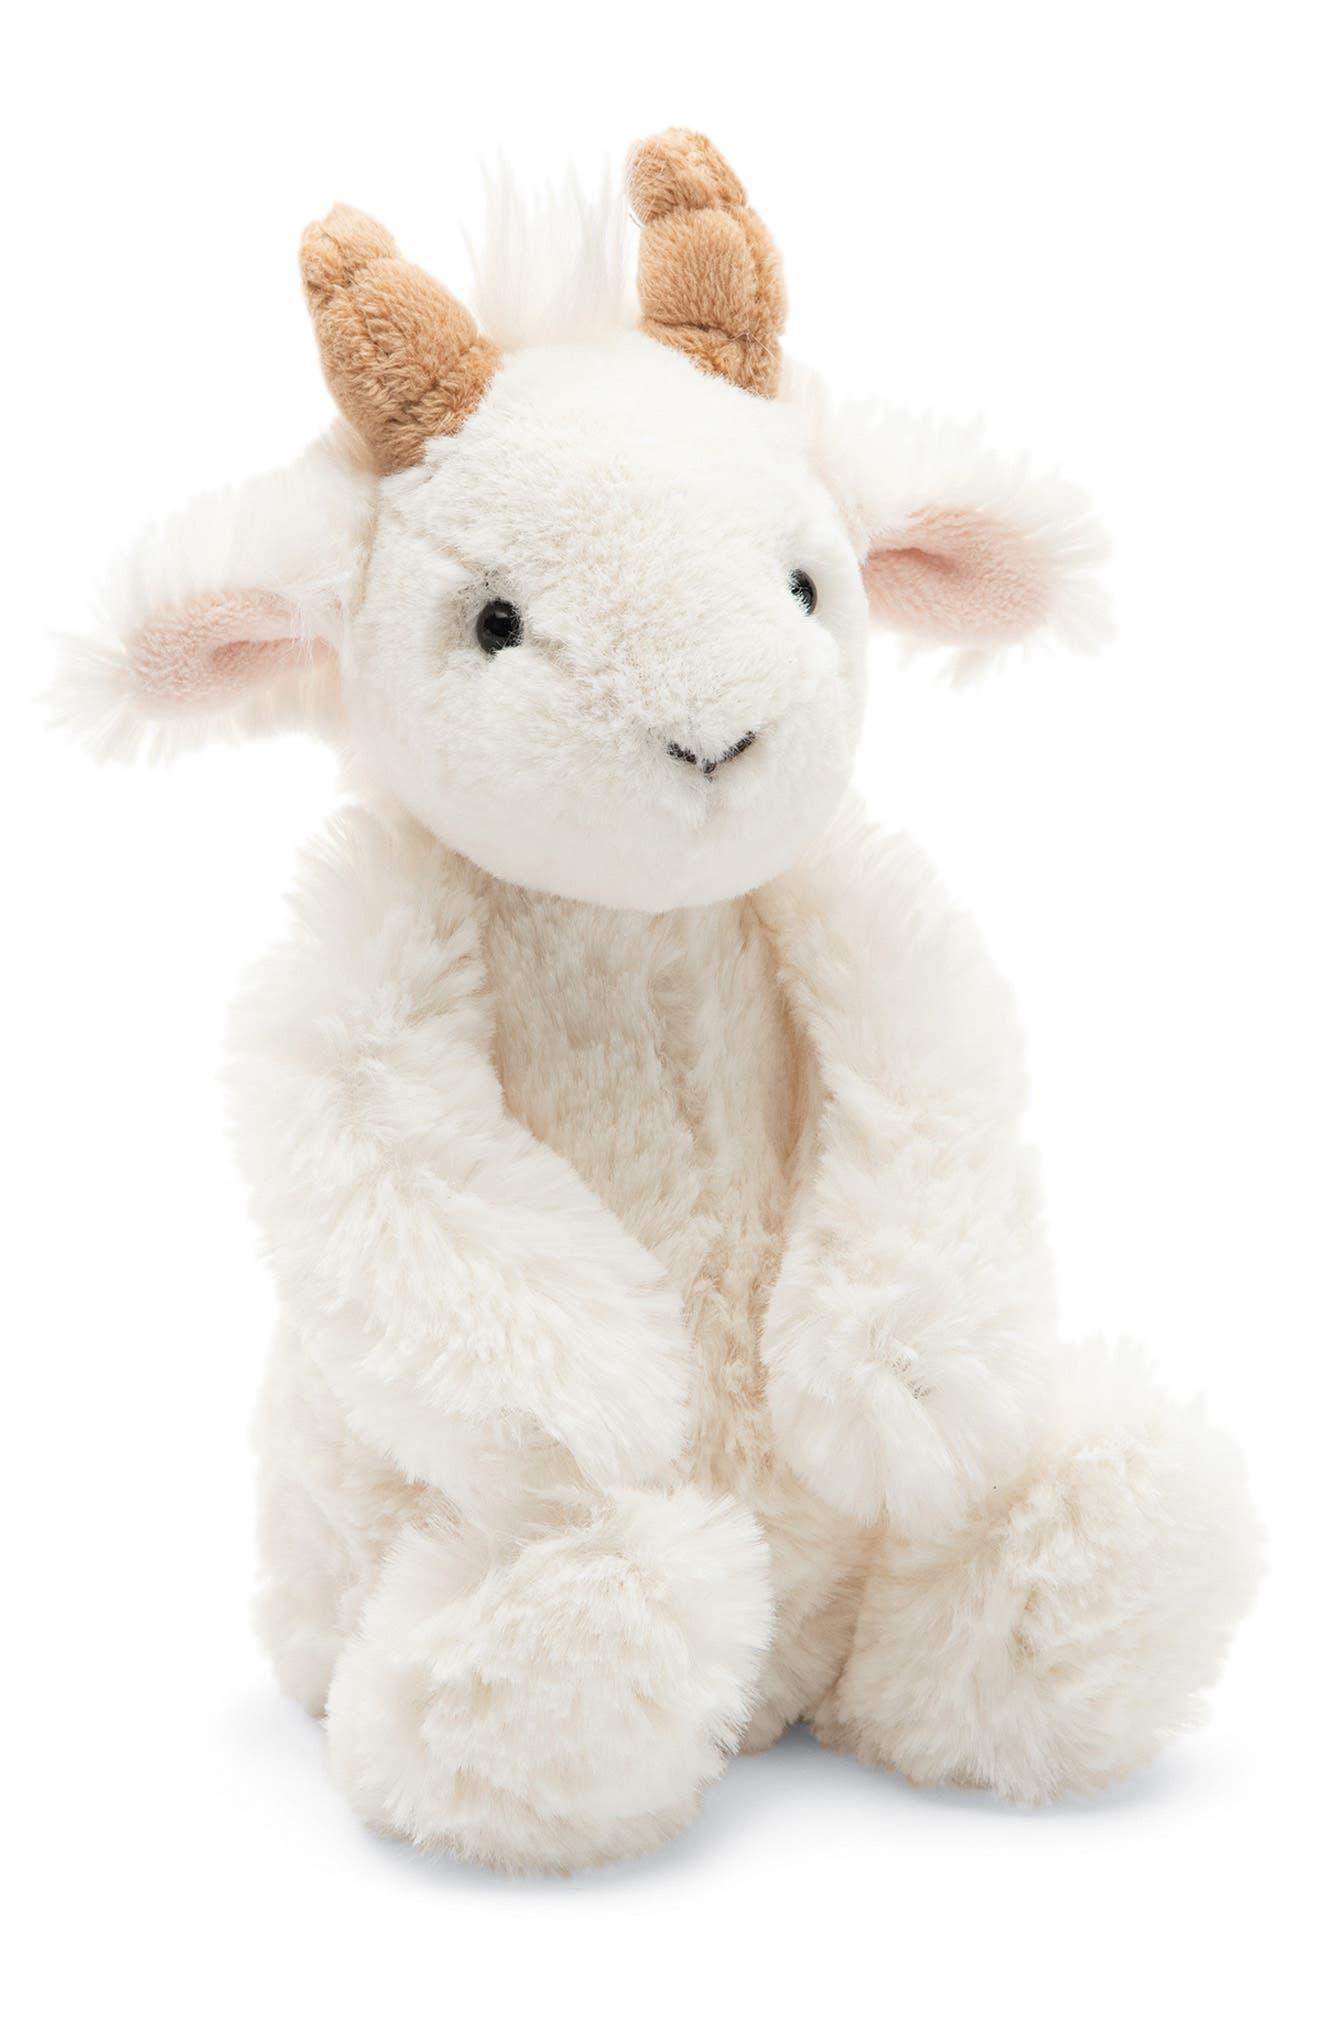 Jellycat Small Bashful Goat Stuffed Animal Nordstrom